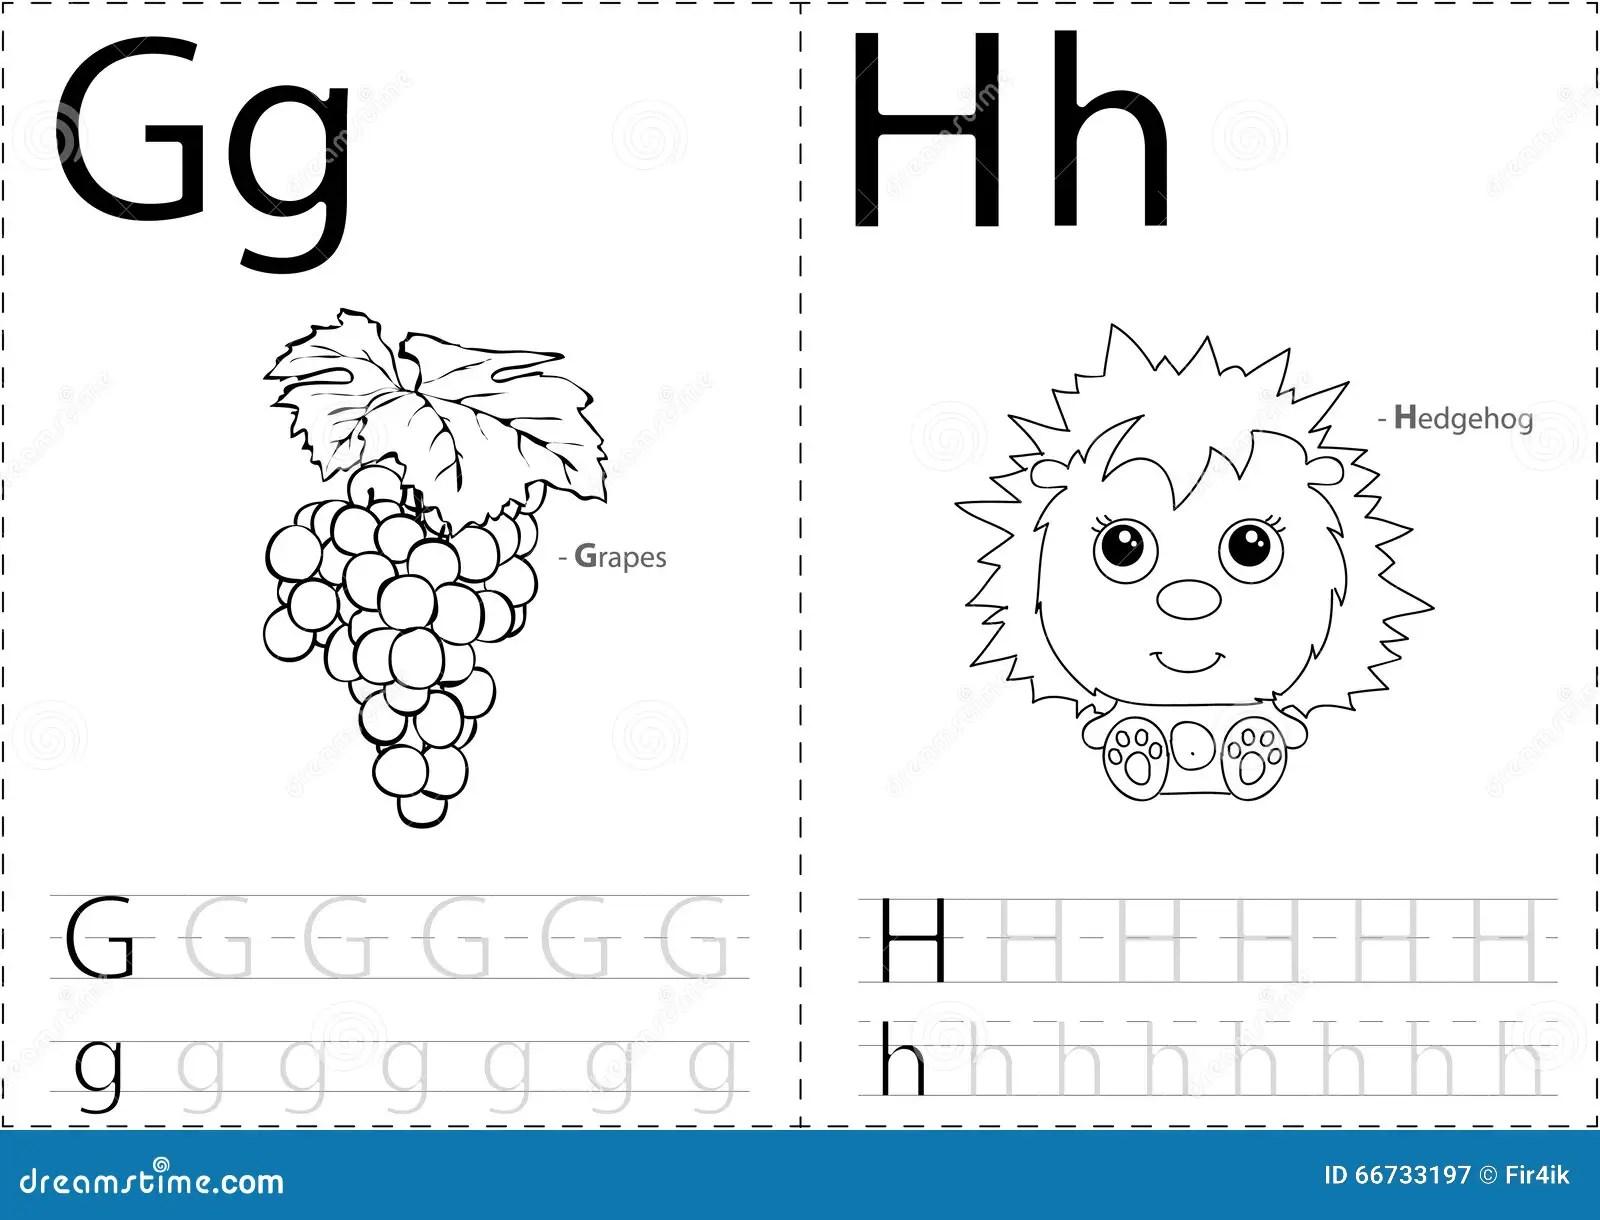 Cartoon Grapes And Hedgehog. Alphabet Tracing Worksheet